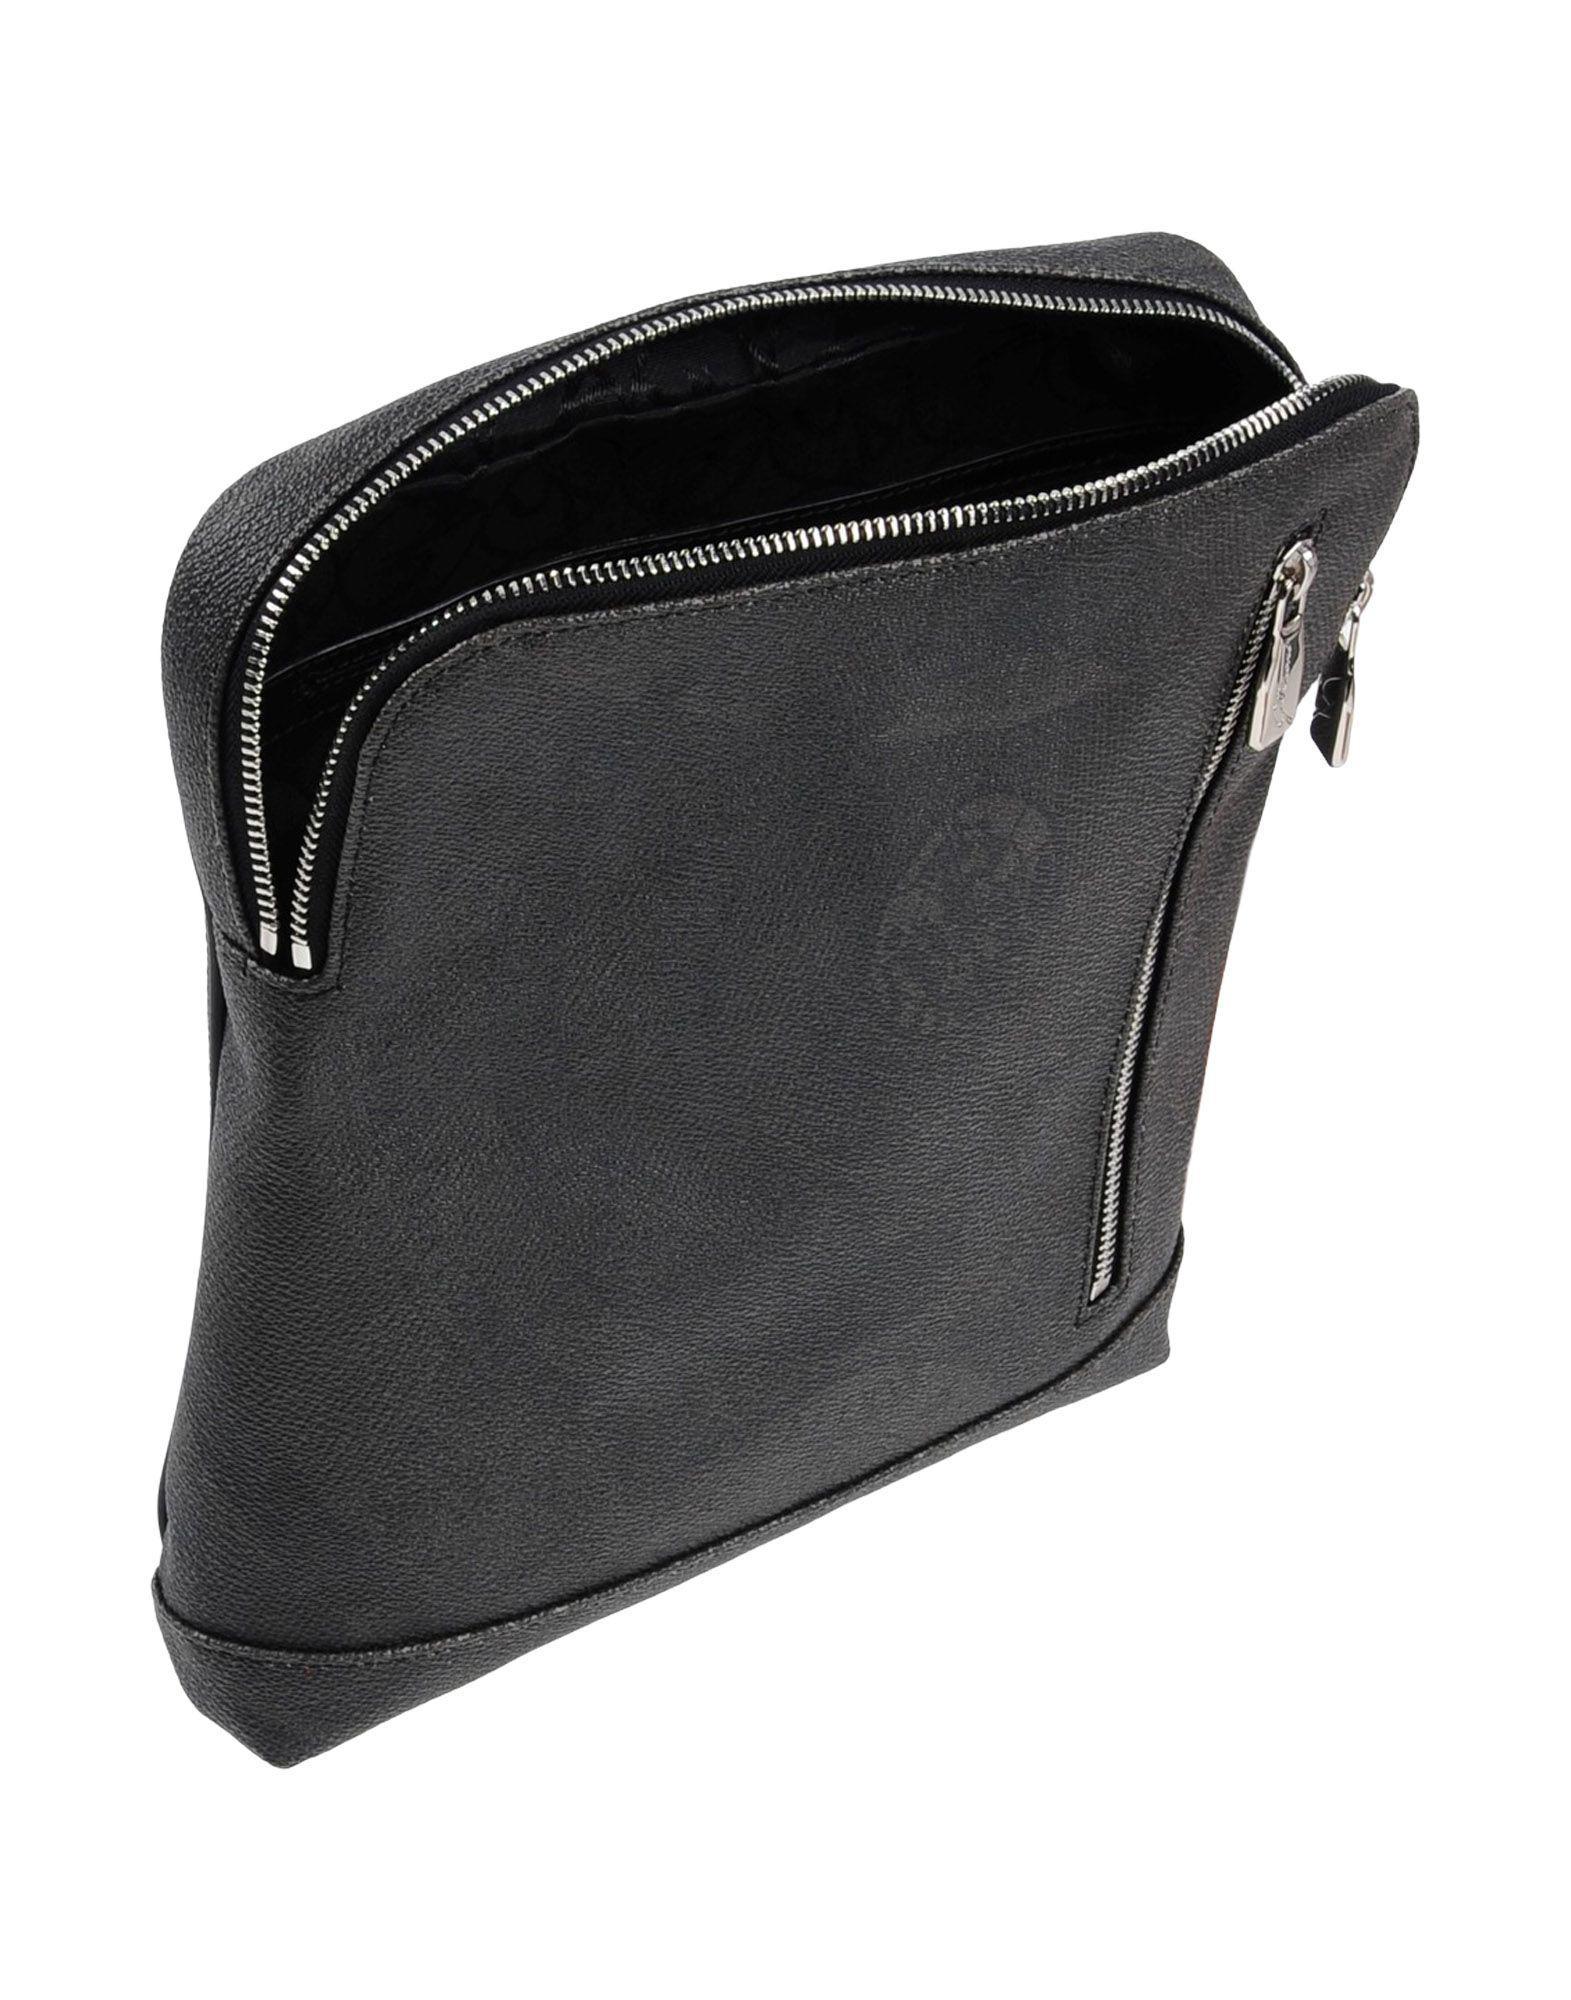 Gattinoni Cross-body Bags in Black